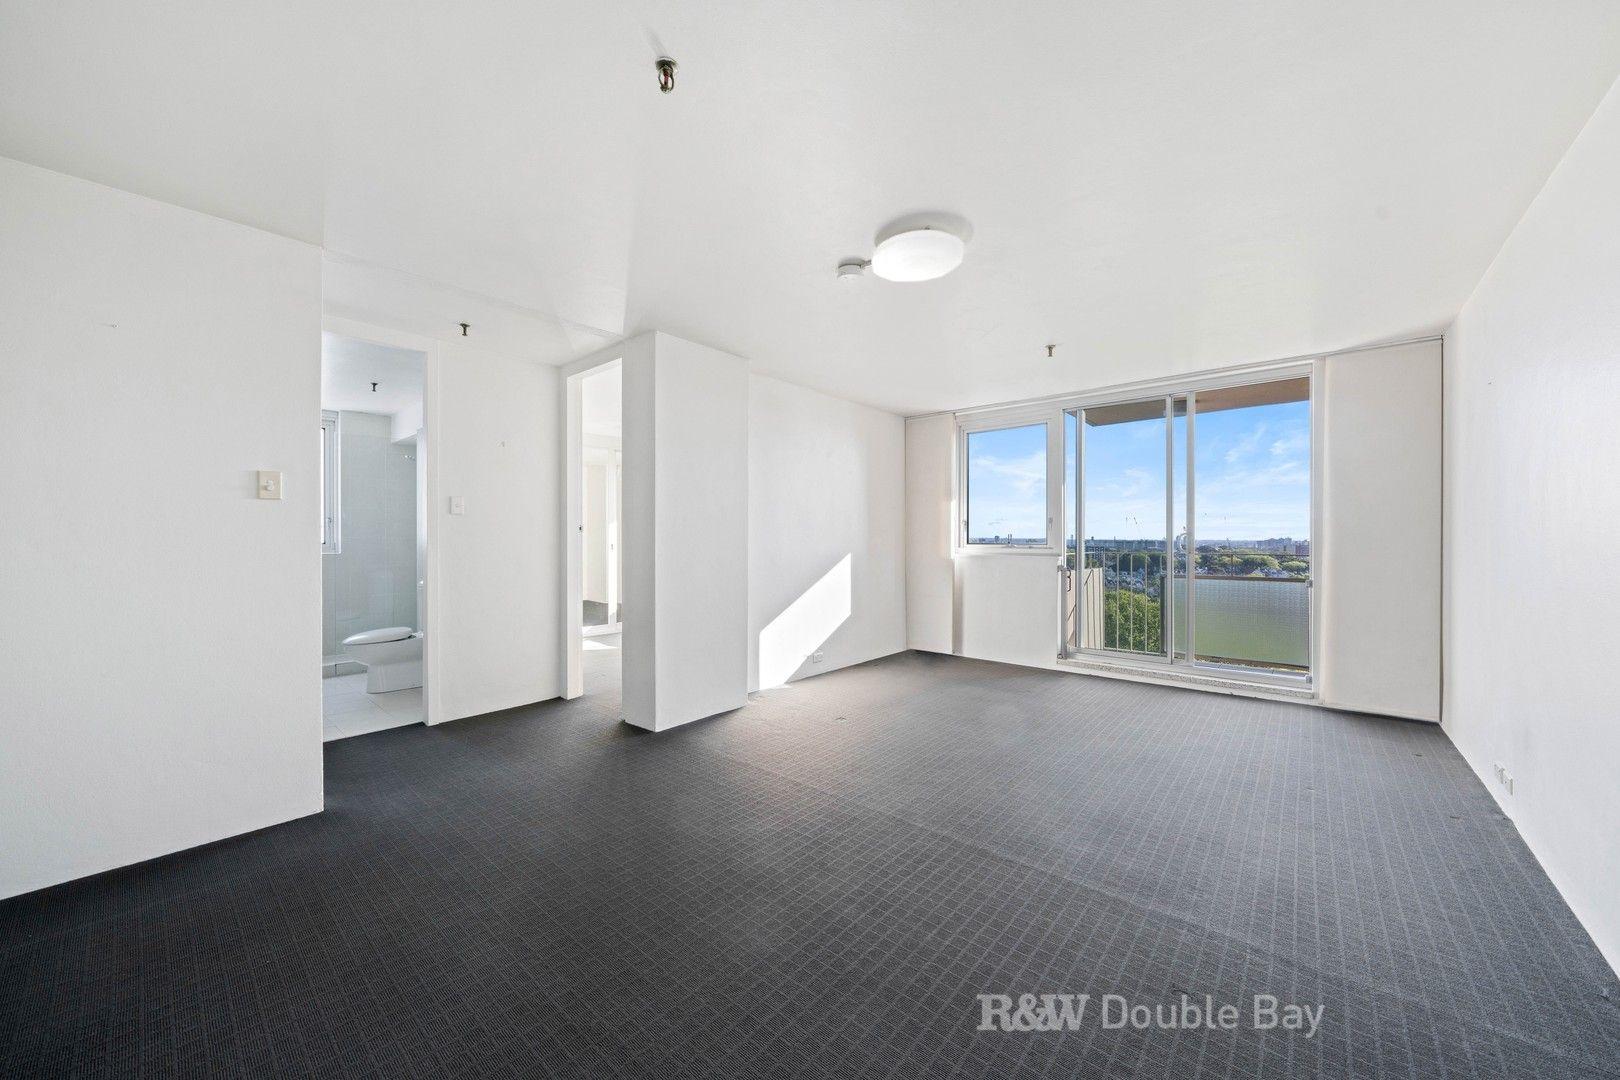 2 bedrooms Apartment / Unit / Flat in 45/8-14 Fullerton Street WOOLLAHRA NSW, 2025